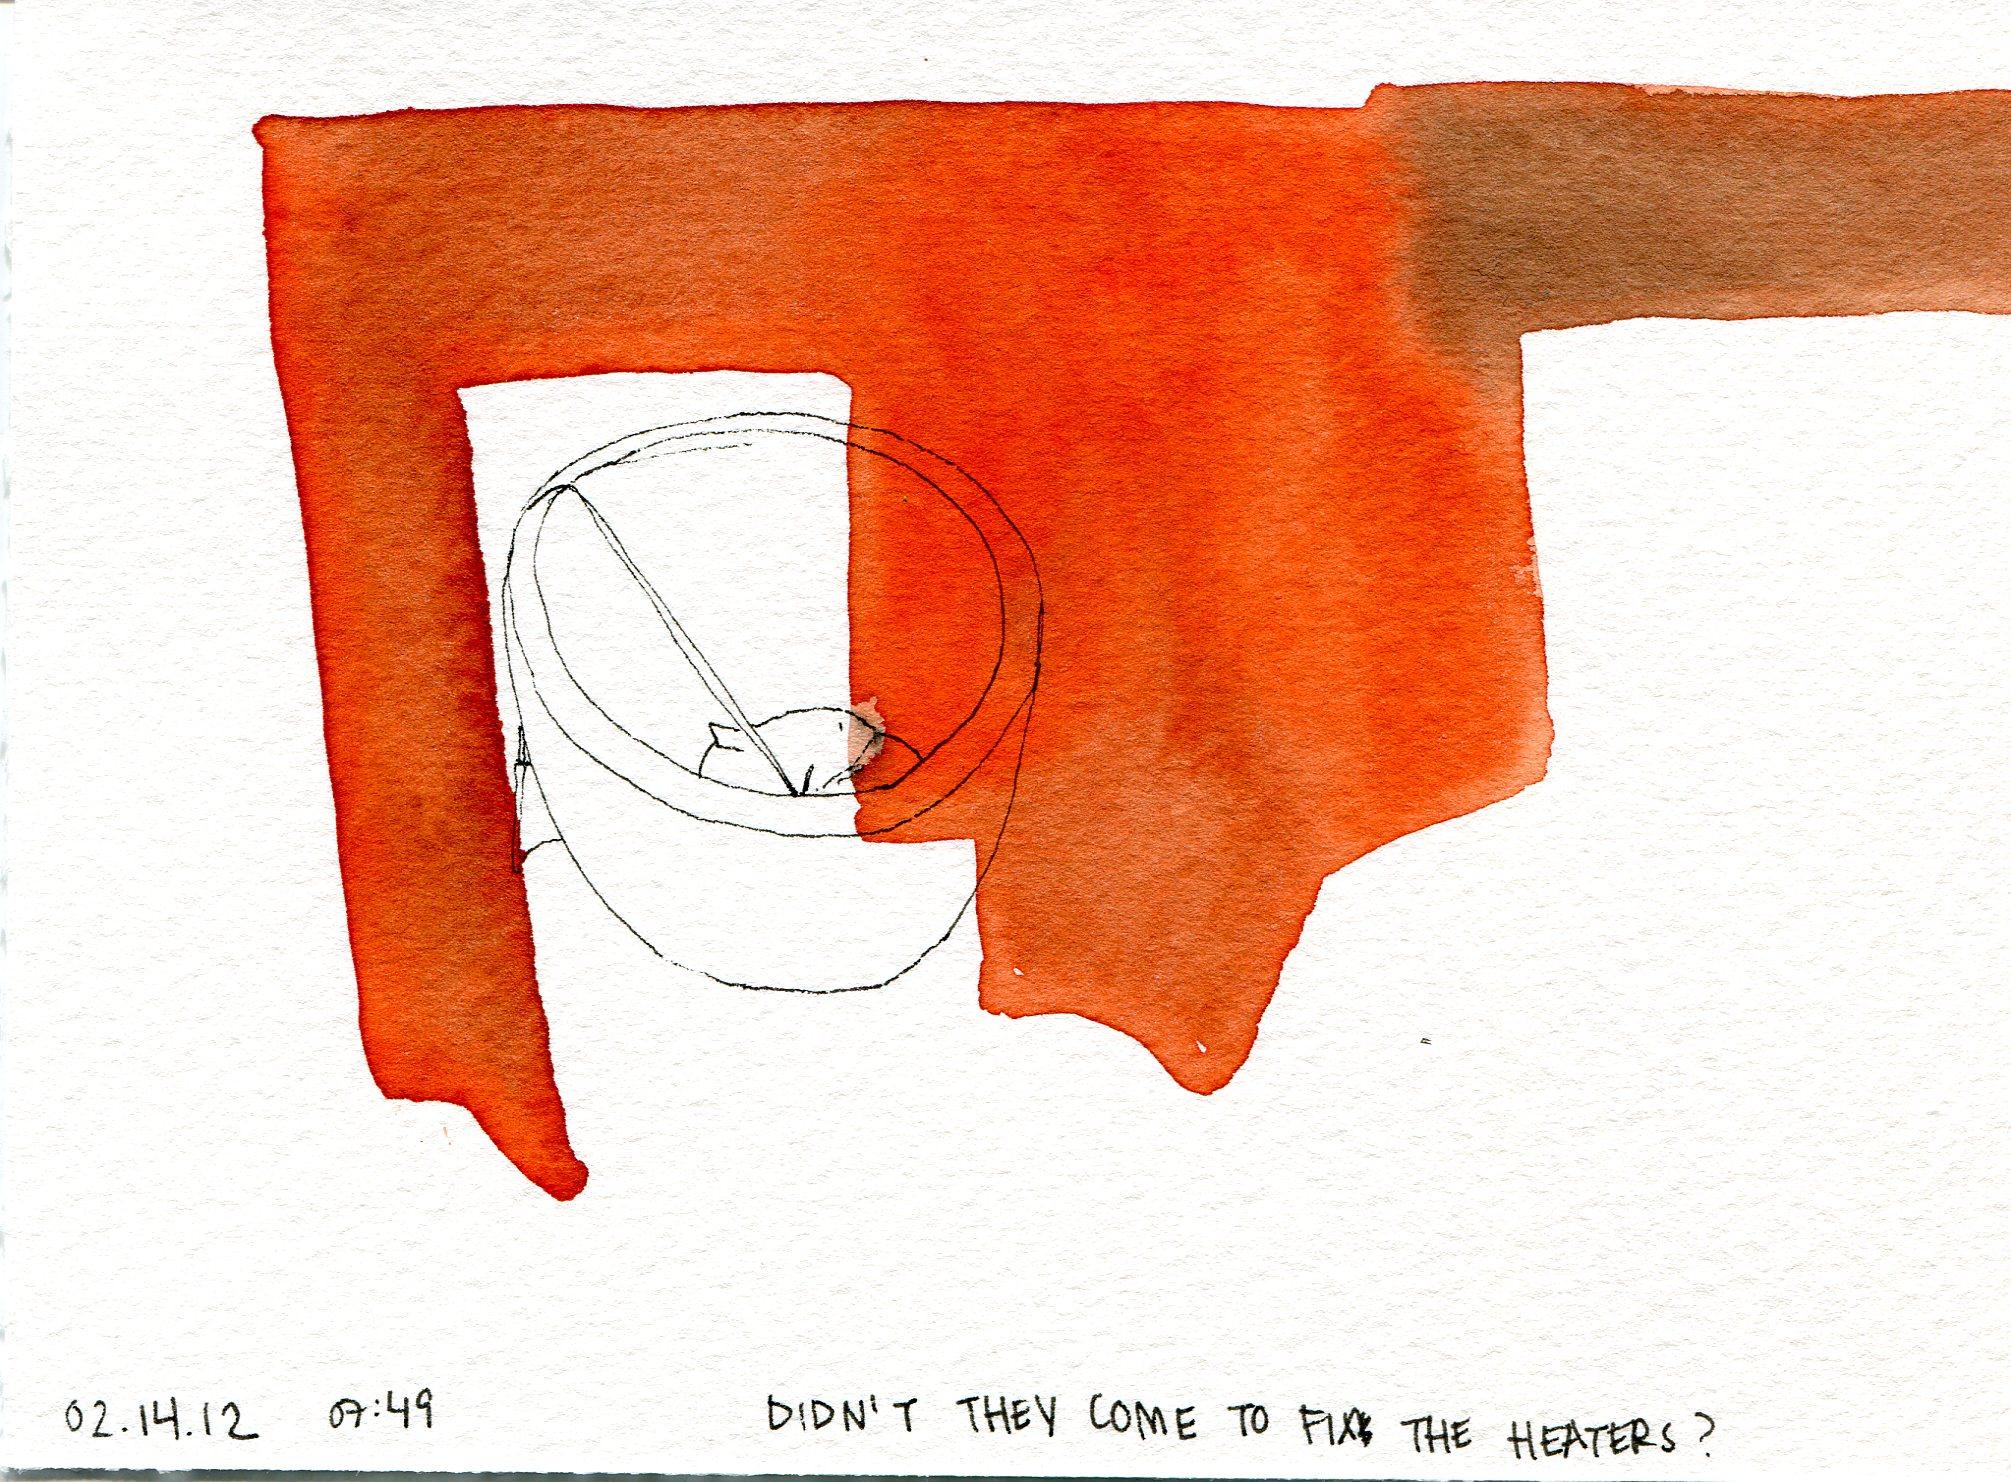 2012-02-17 drawing005.jpg